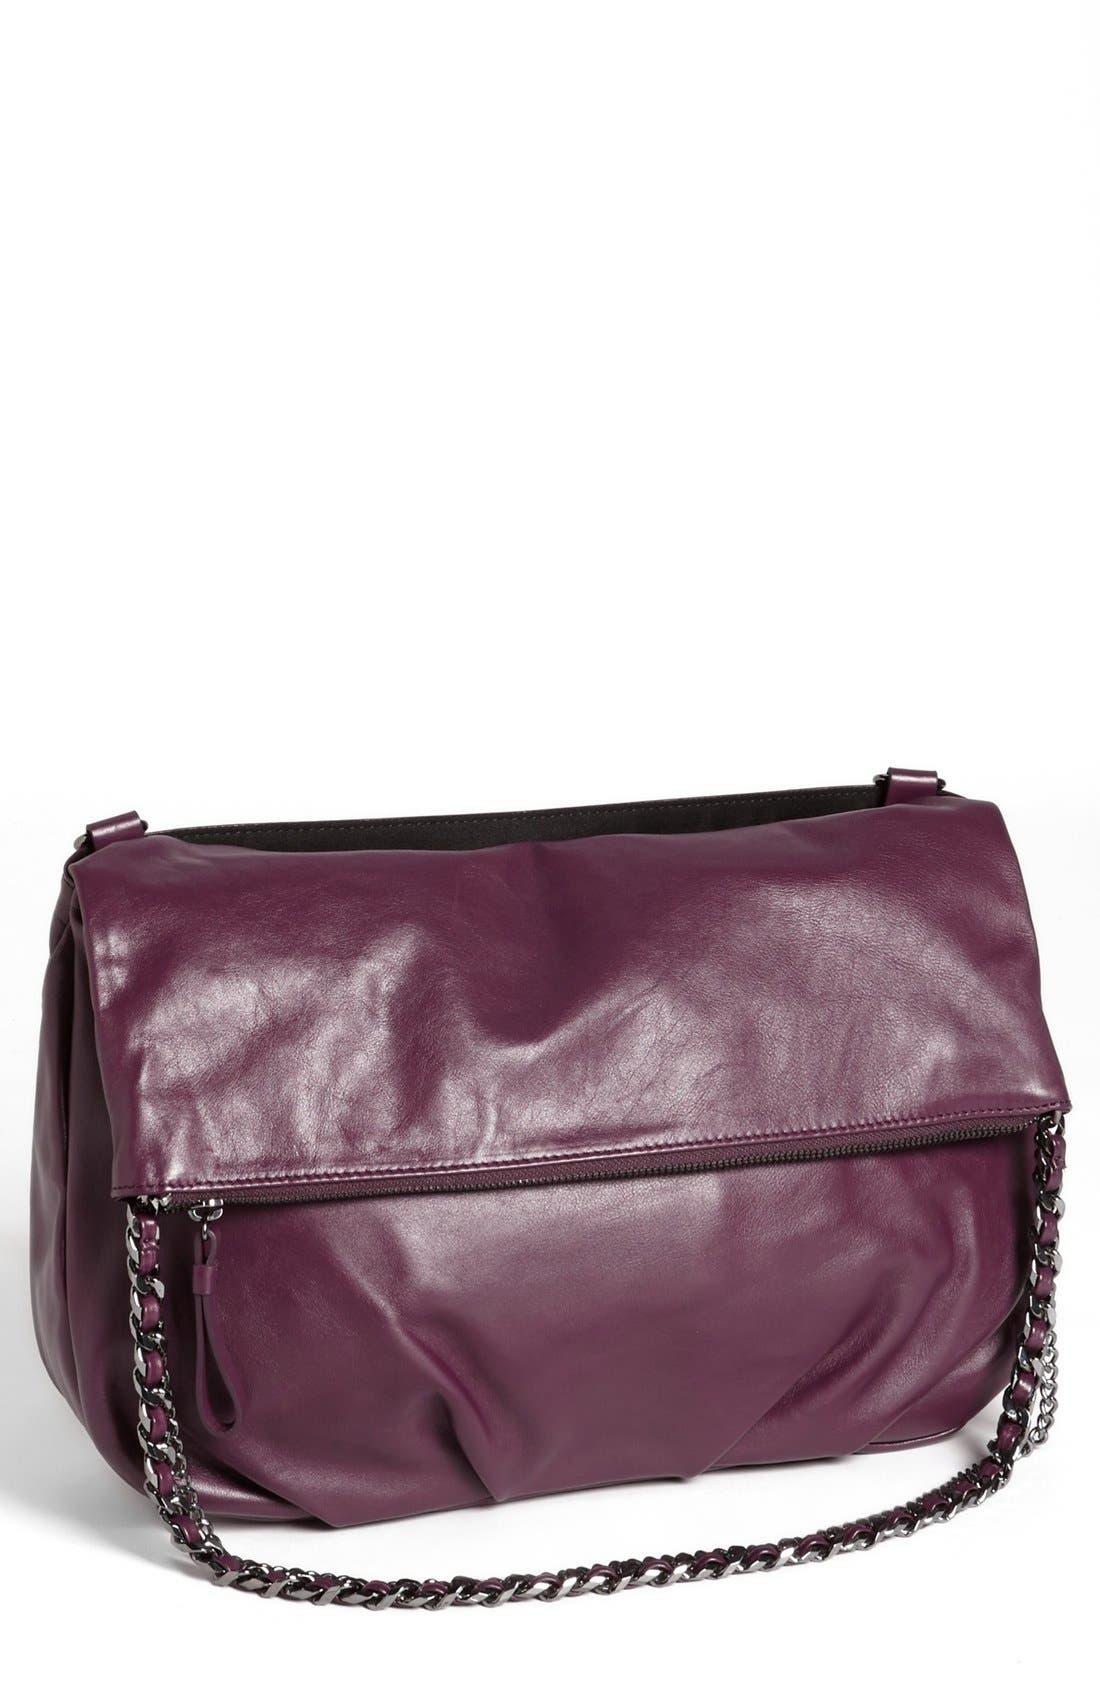 Alternate Image 1 Selected - Trouvé Foldover Leather Crossbody Bag